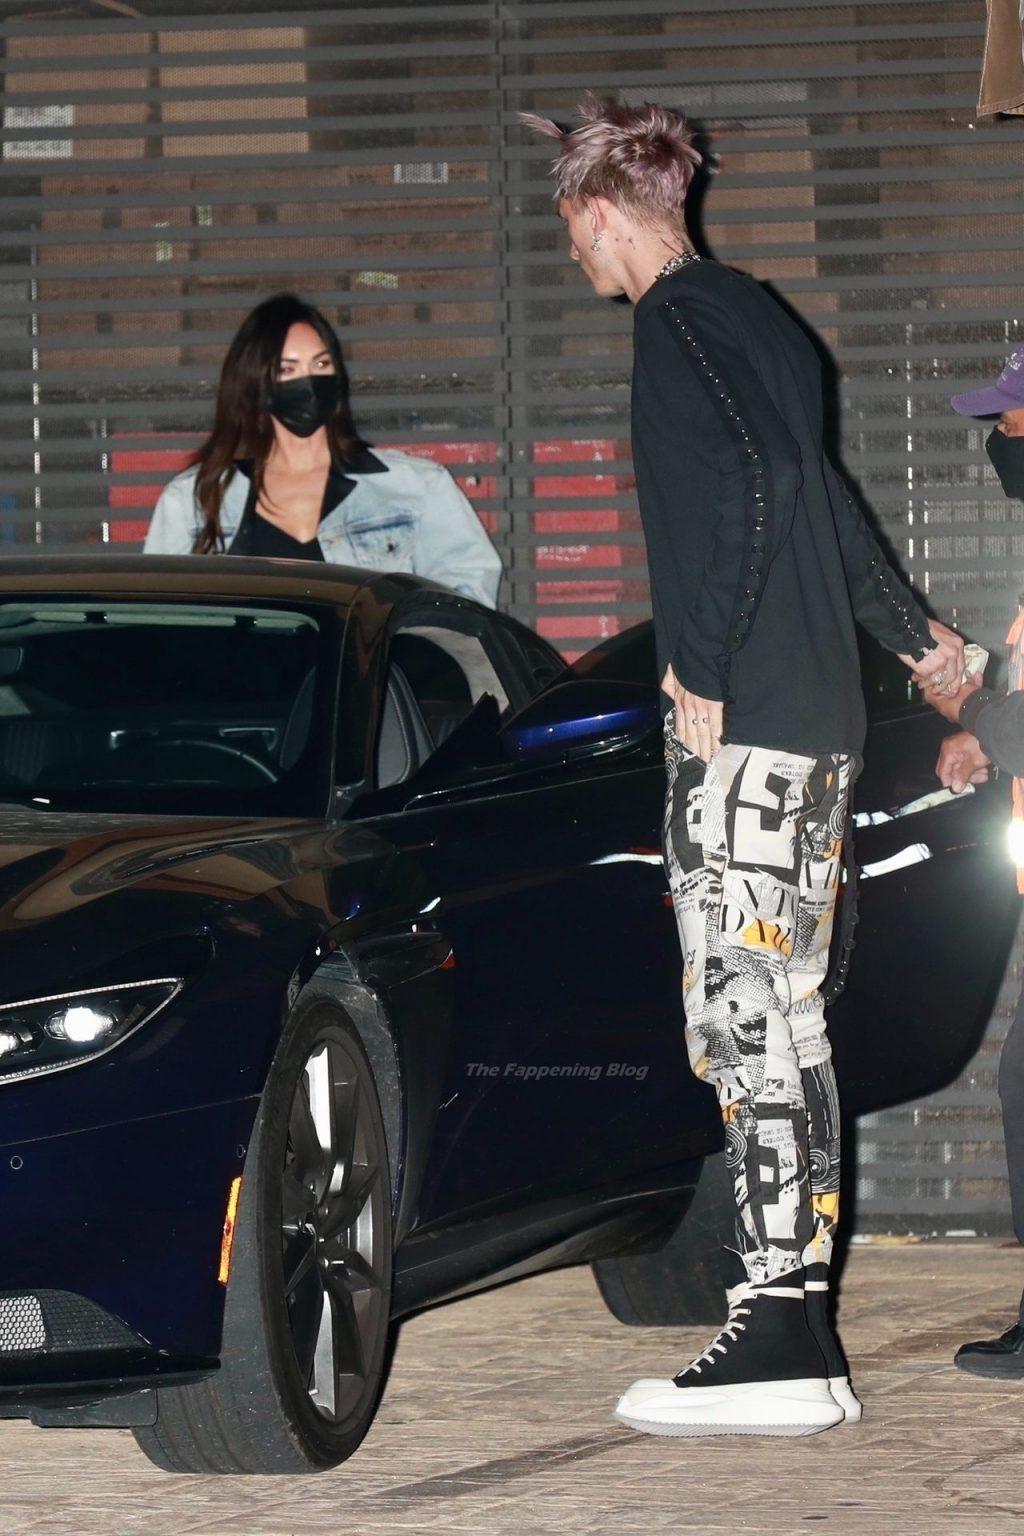 Megan Fox & Matching Gun Kelly Arrive for a Dinner Date in Malibu (59 Photos)